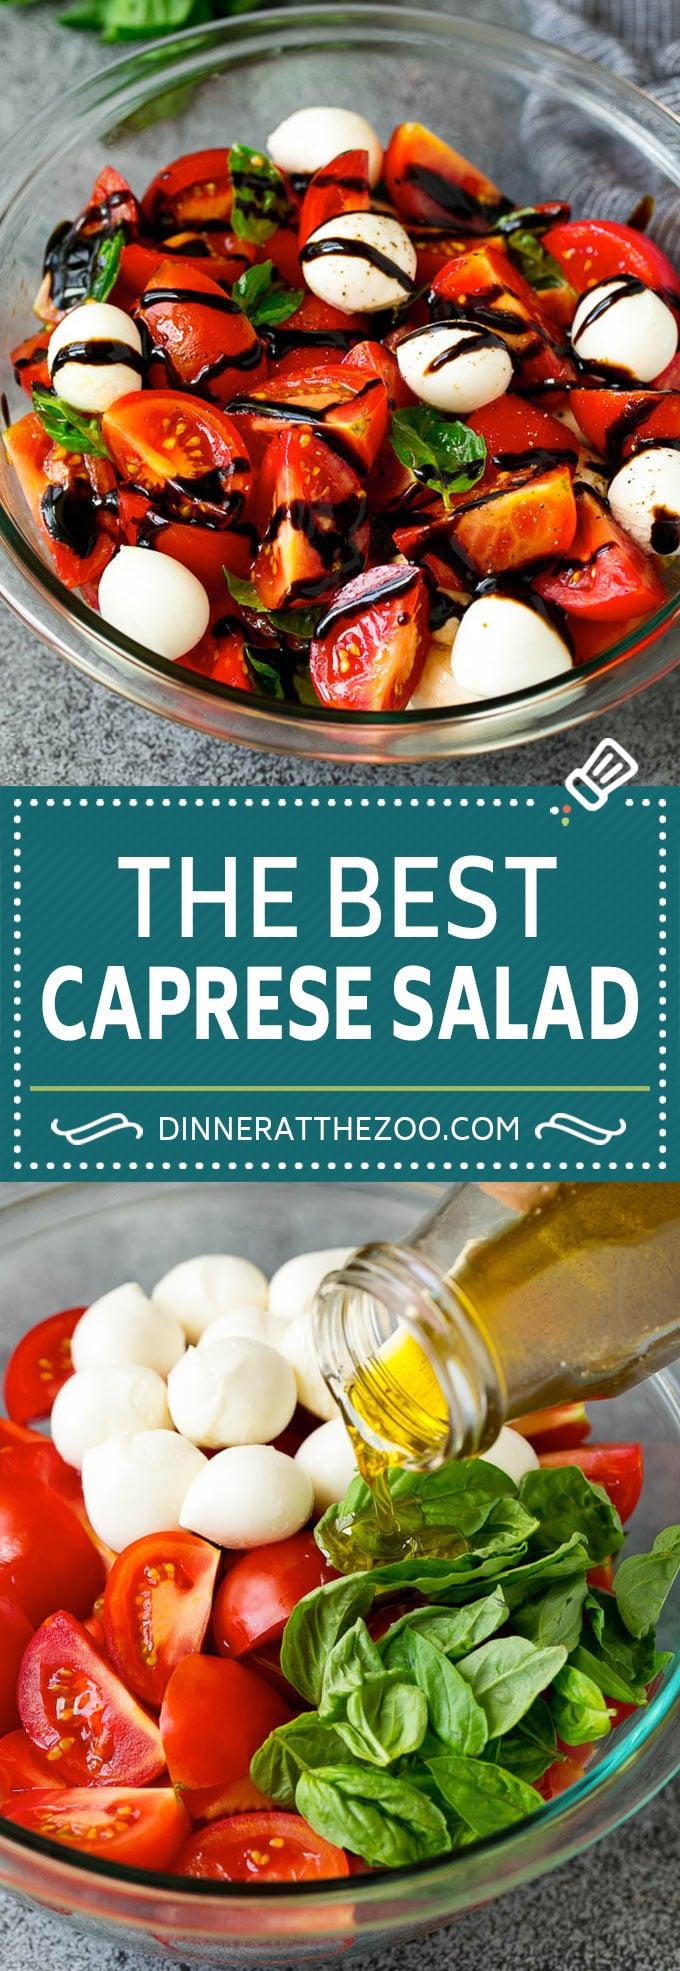 Caprese Salad Recipe | Tomato Salad #salad #tomato #mozzarella #cheese #basil #caprese #summer #dinneratthezoo